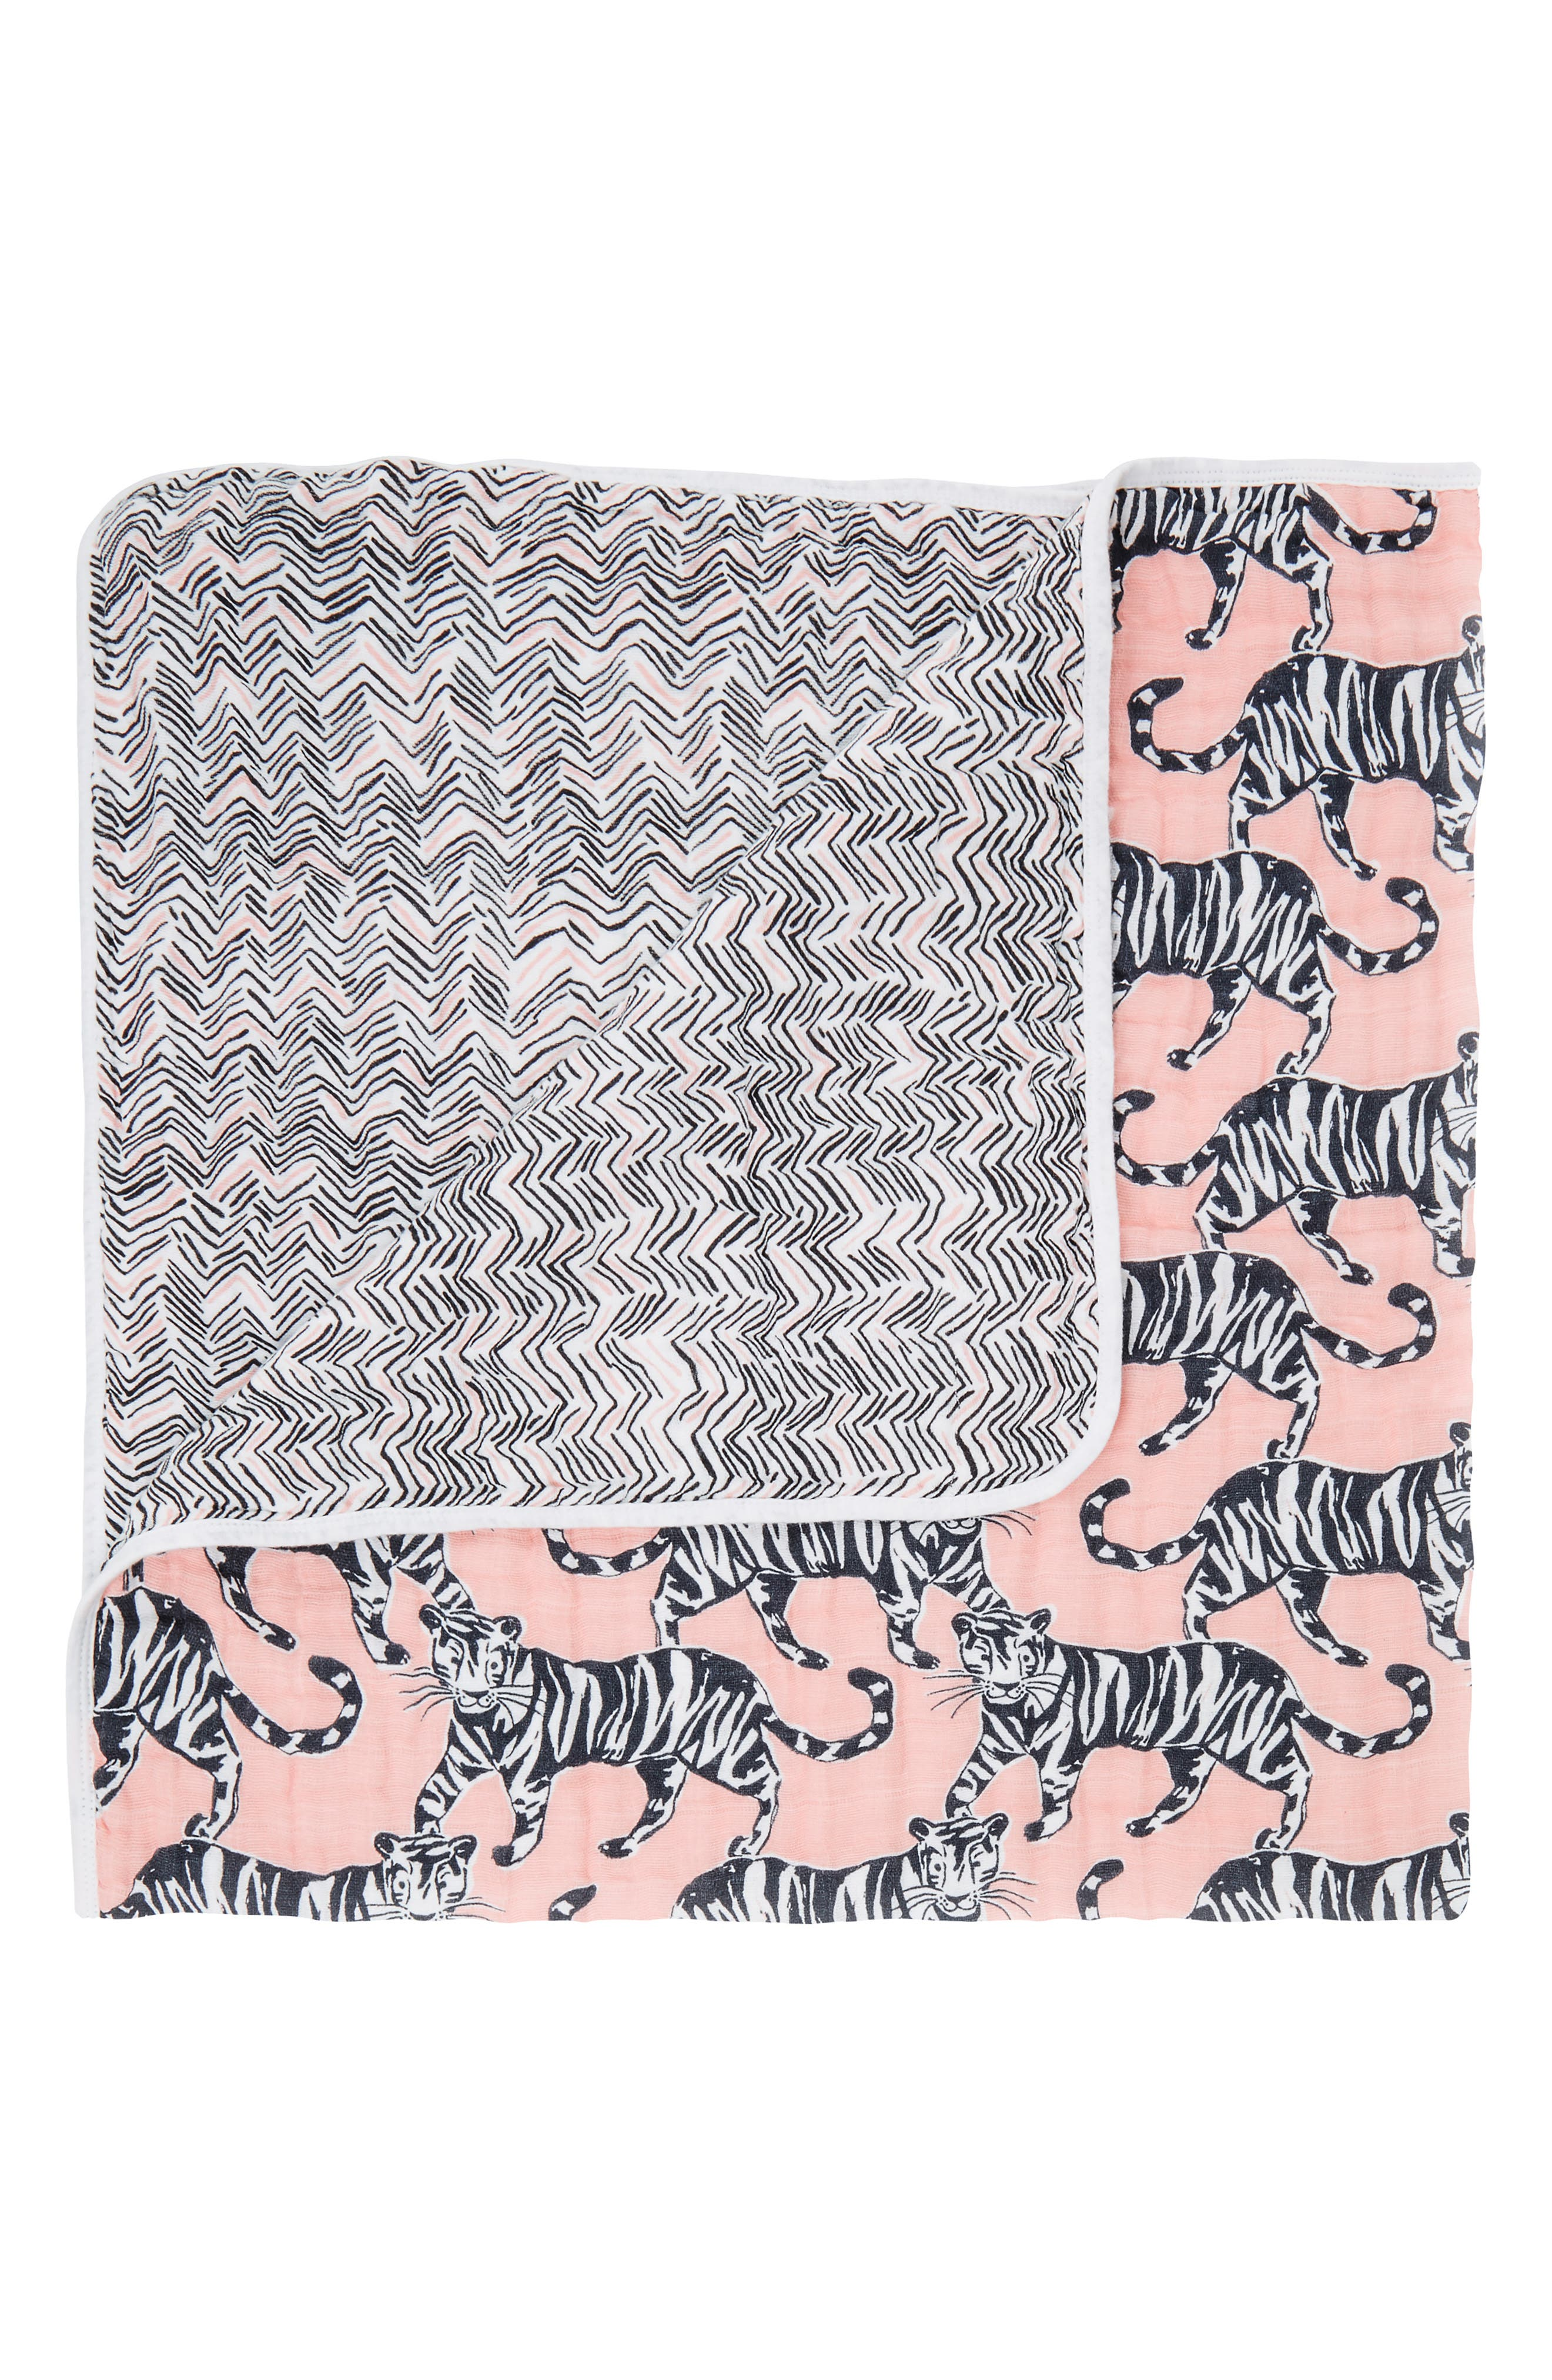 ADEN + ANAIS White Label Pacific Paradise Classic Dream Blanket<sup>™</sup>, Main, color, PACIFIC PARADISE